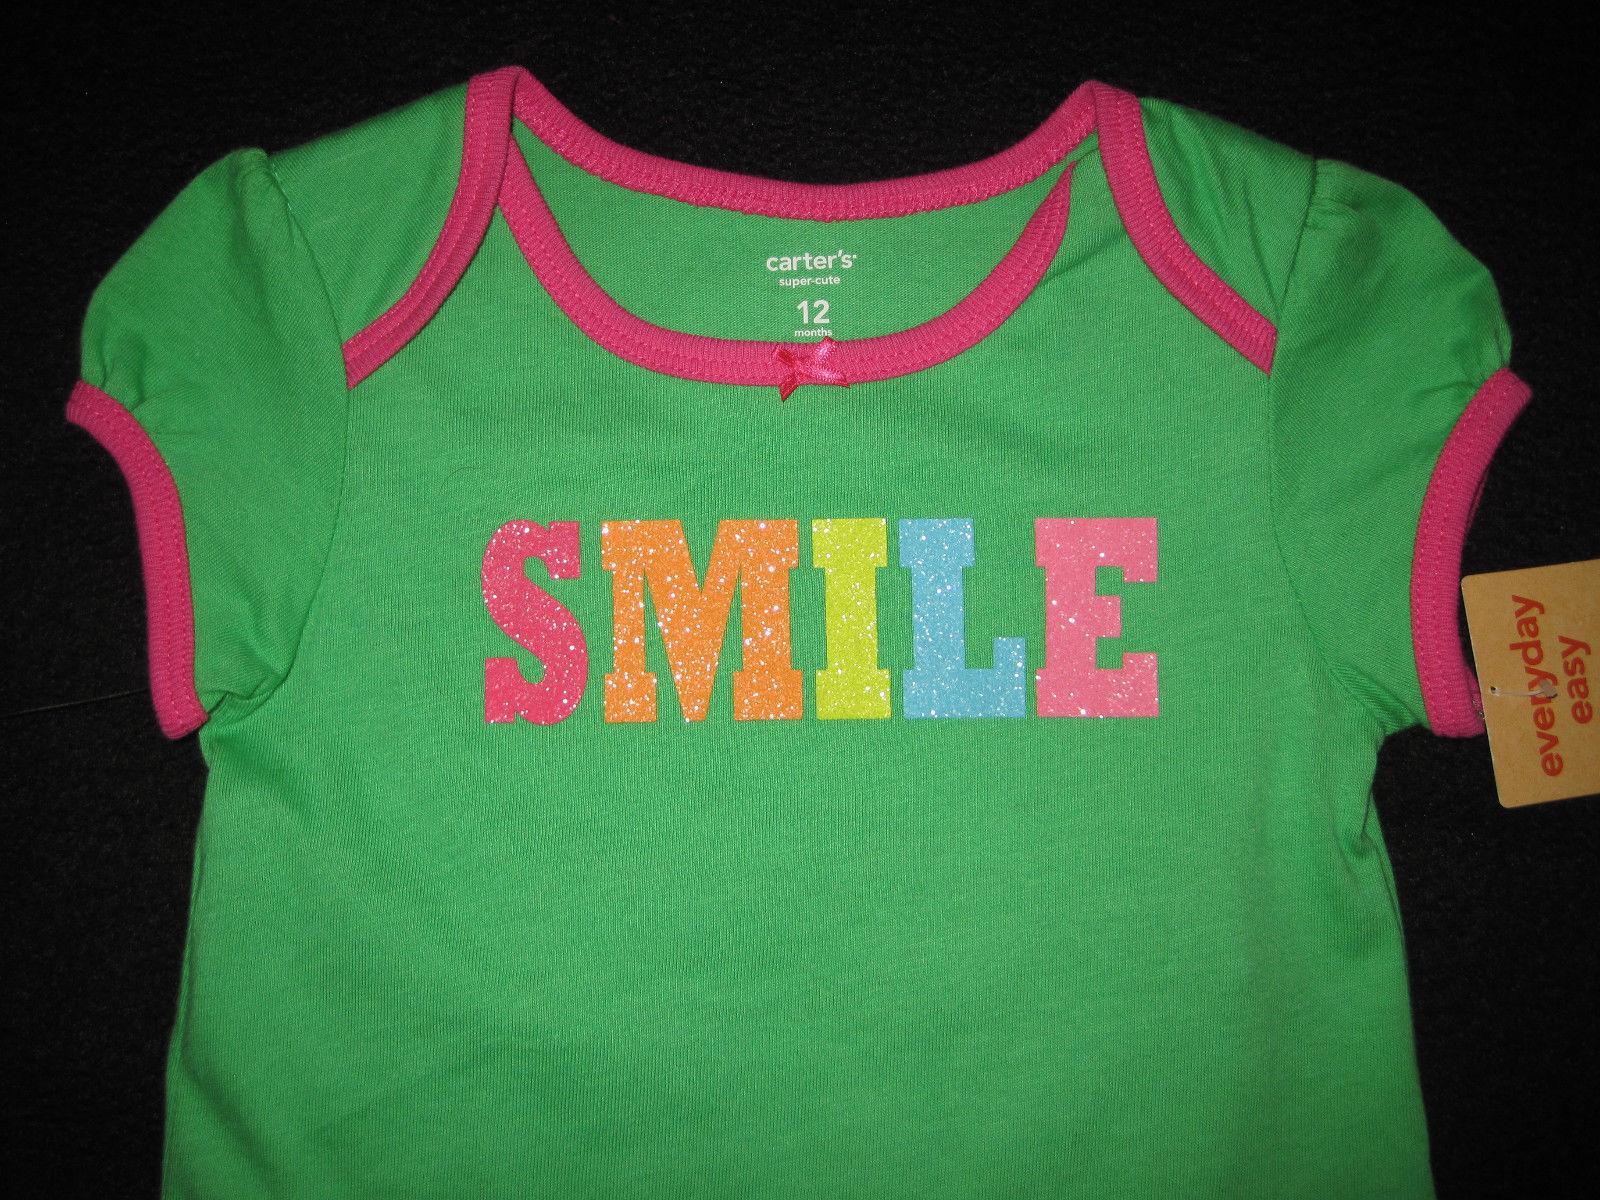 GIRLS 12 MONTHS - Carter's Everyday - Knit 3-PIECE DRESS & PANTY SET image 3